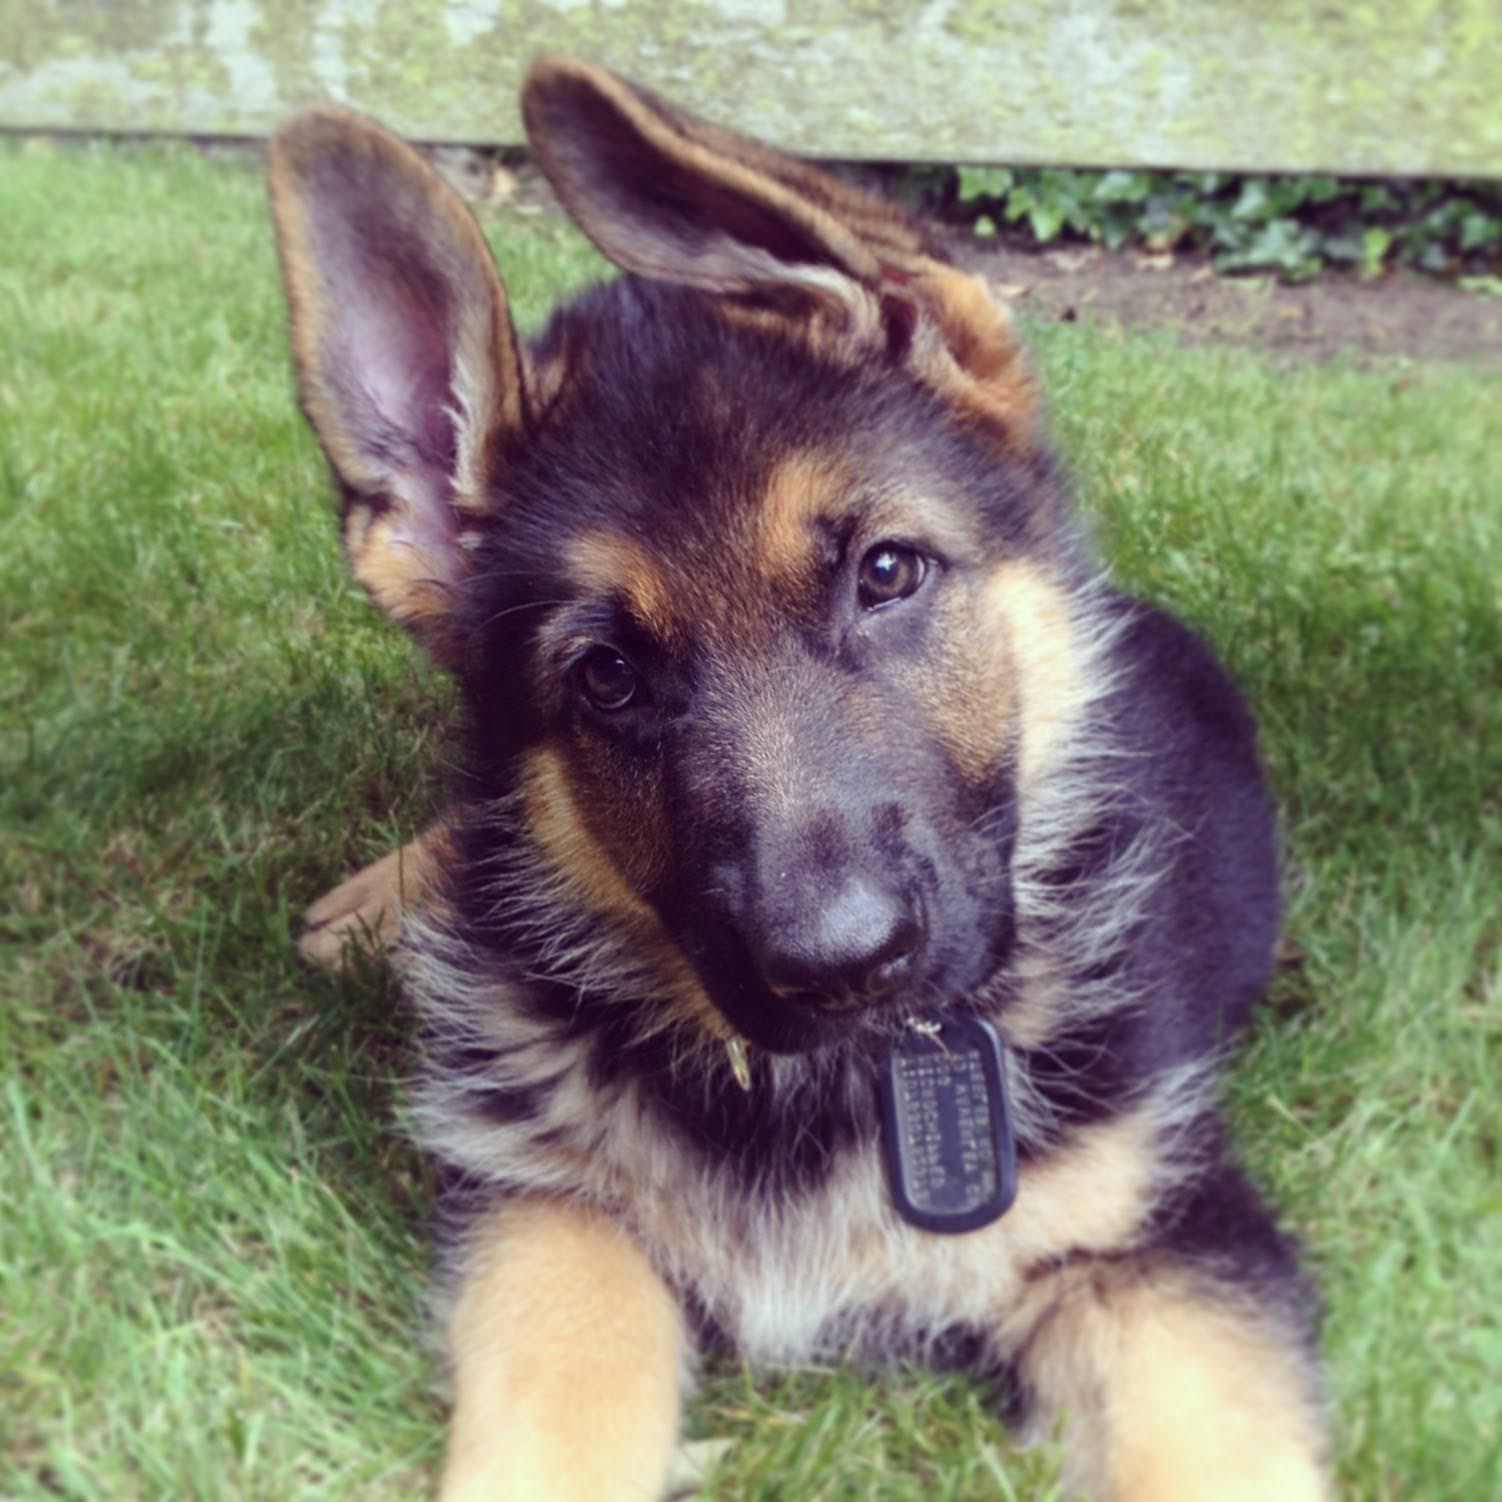 1 year old german shepherd puppy dog breed information